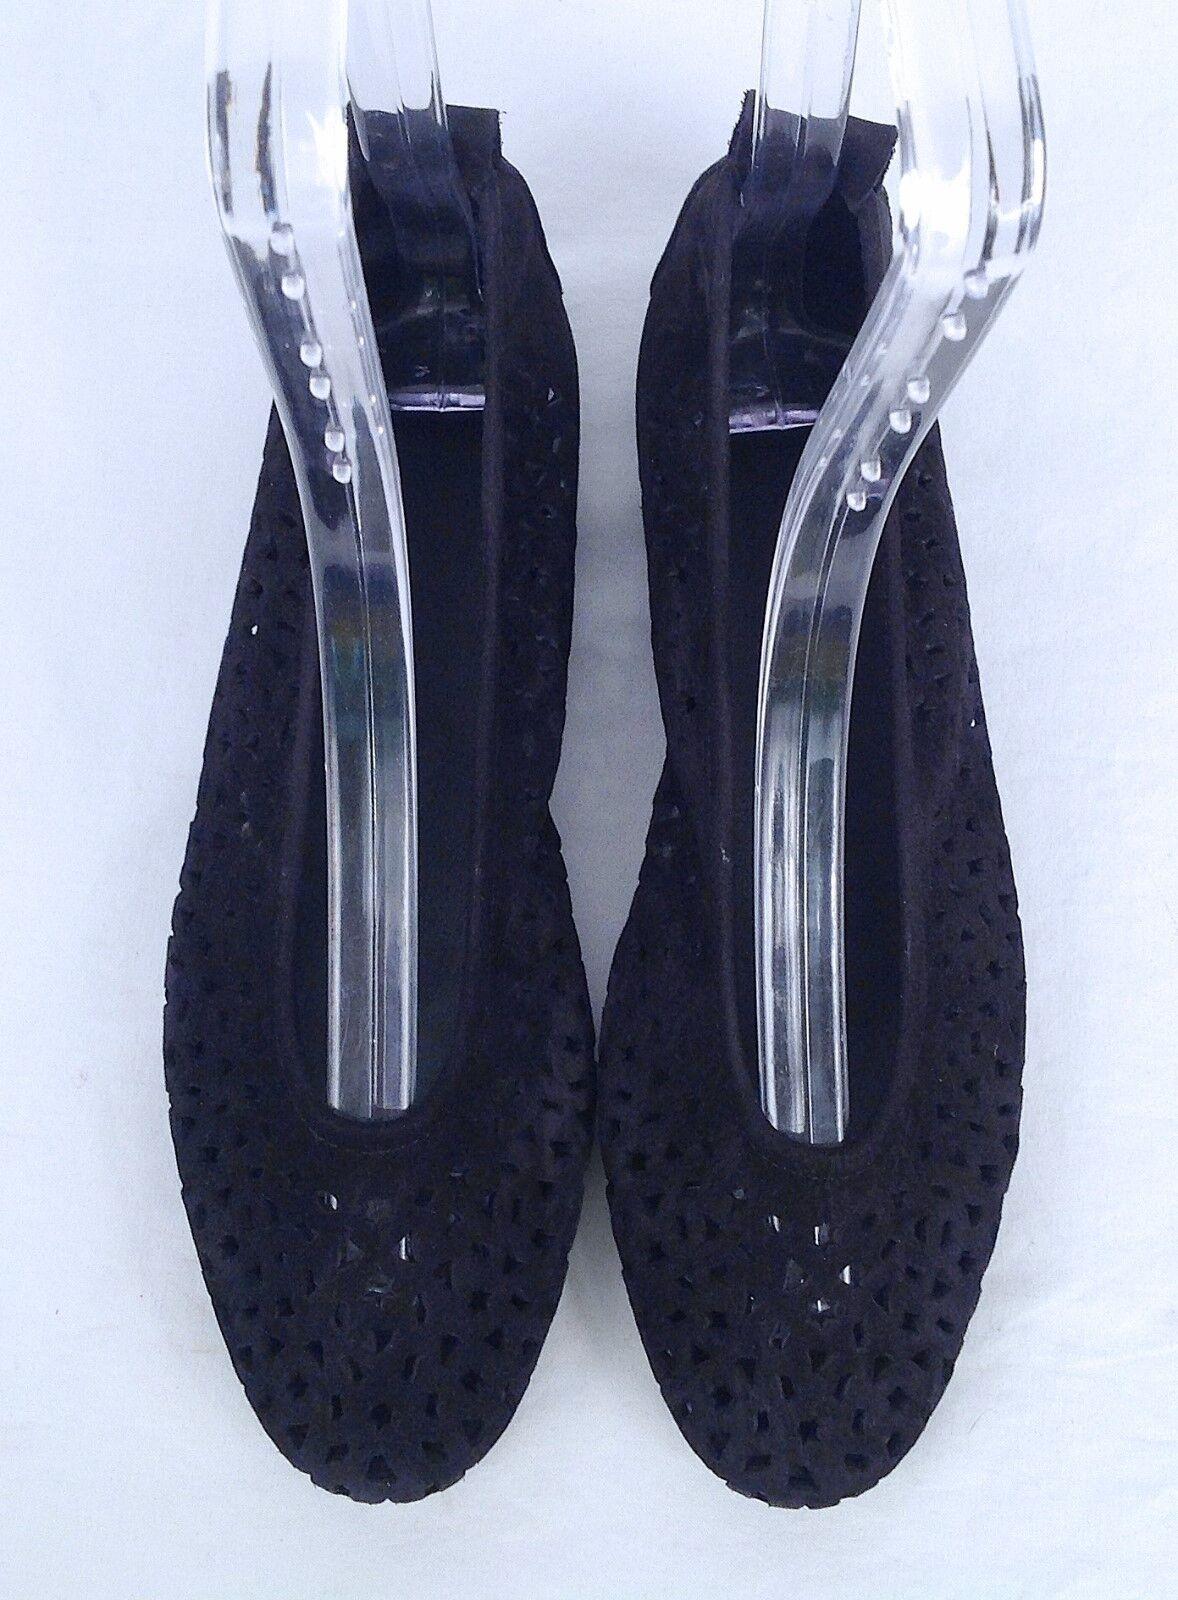 Arche 'Lilly' Flat - Black -Size -US 6  37 EU- 298   (P37)